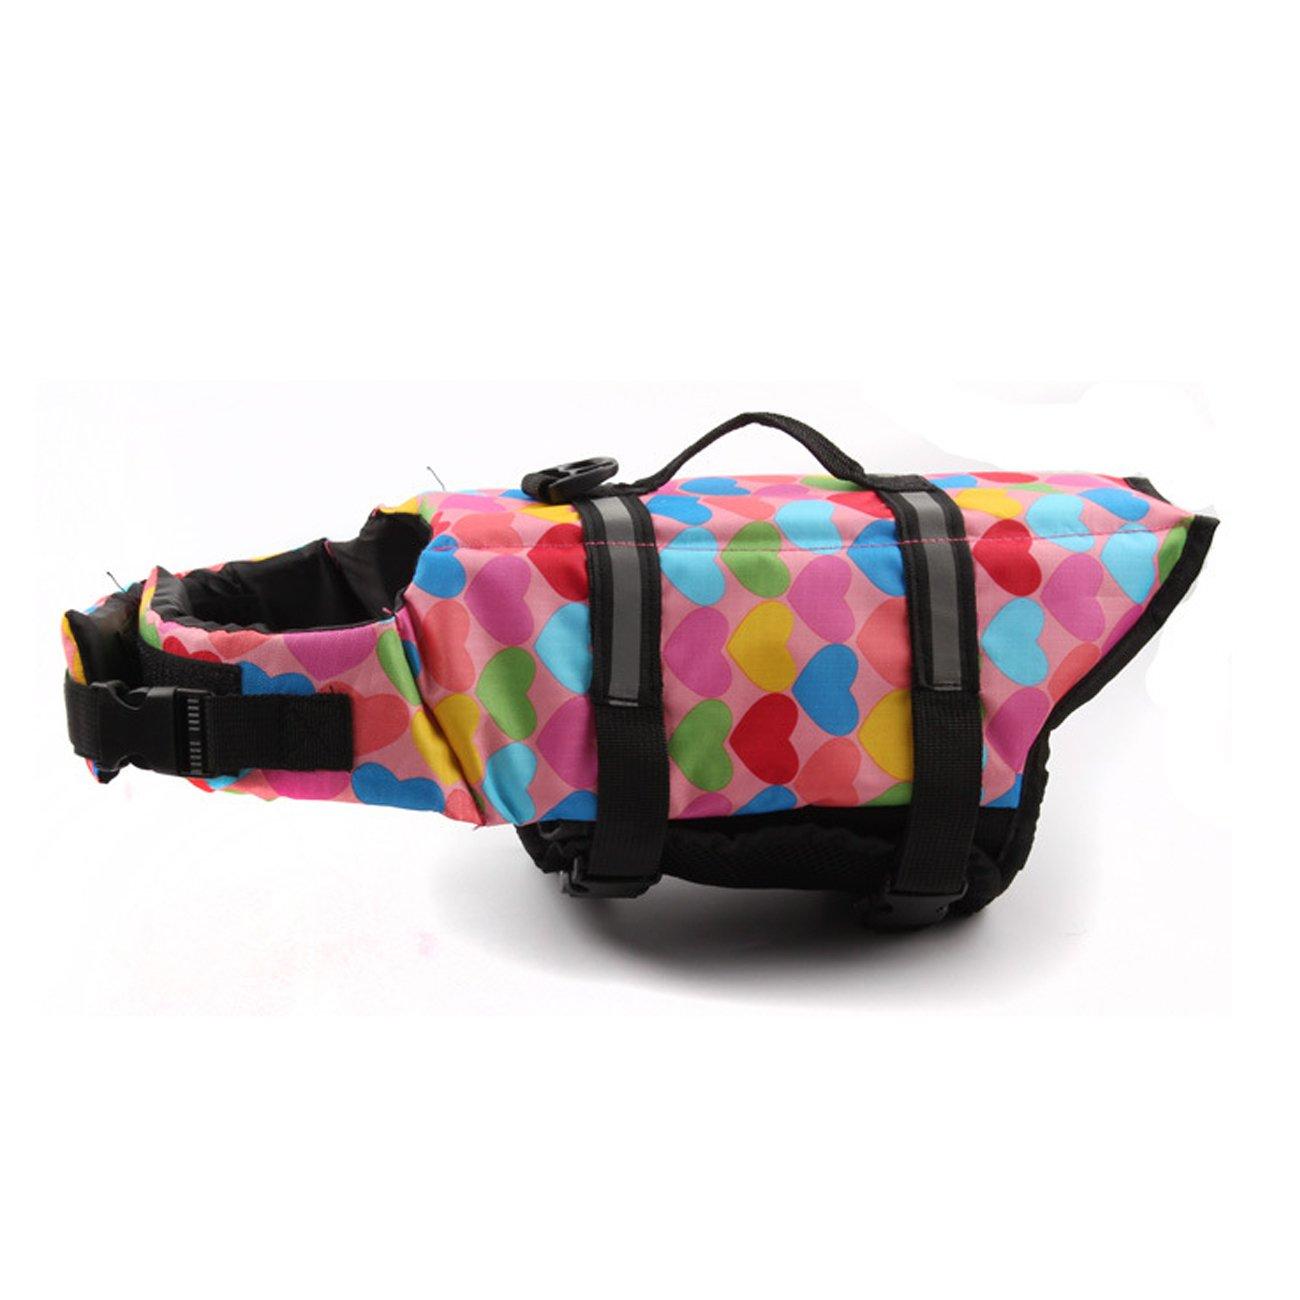 Pet Life Swimming Jacket Reflective Dog Prevent Loss Adjustable Saver Ruffwer Carrier Preserver Shark Vest